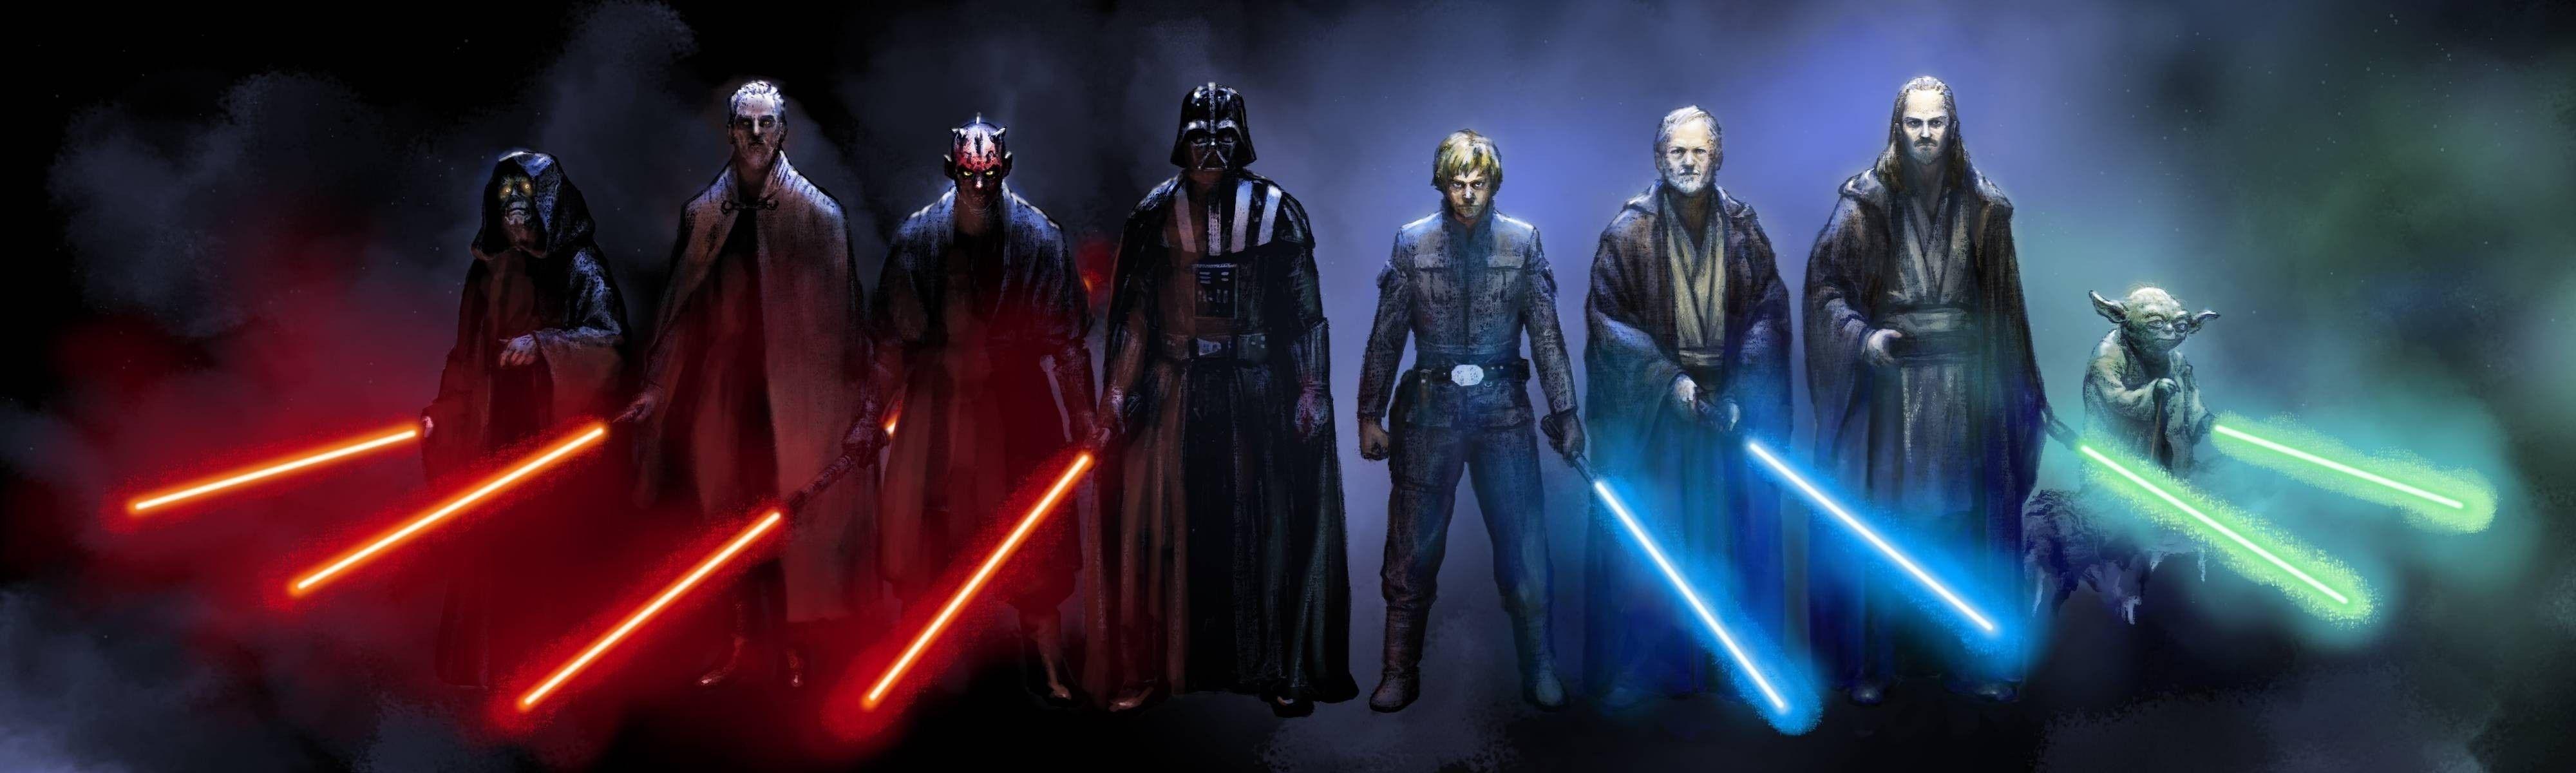 Sith/Jedi Wallpaper - Imgur